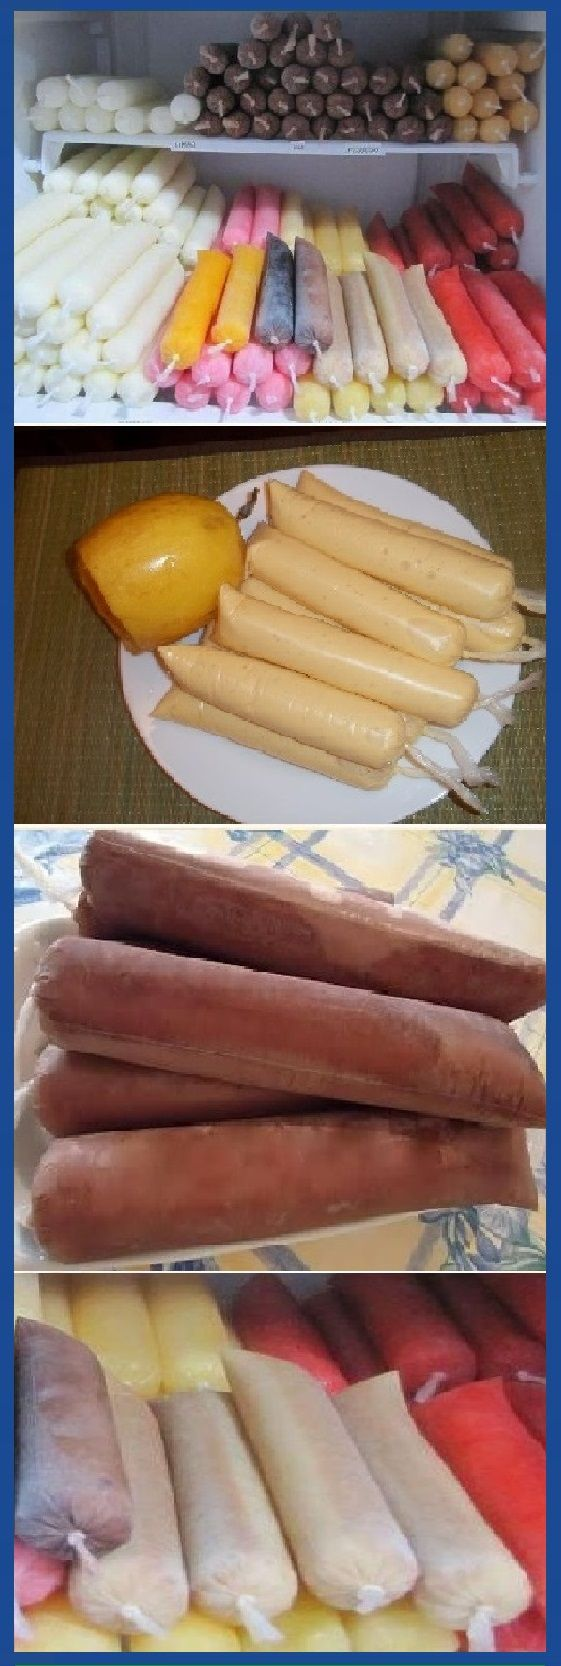 HELADITOS caseros con fruta y agua para vender.  #heladitos #helados #gelato #frutas #paravender #negocio  #panfrances #pain #bread #breadrecipes #パン #хлеб #brot #pane #crema #relleno #losmejores #cremas #rellenos #cakes #pan #panfrances #panettone #panes #pantone #pan #recetas #recipe #casero #torta #tartas #pastel #nestlecocina #bizcocho #bizcochuelo #tasty #cocina #chocolate  Si te gusta dinos HOLA y dale a Me Gusta MIREN...